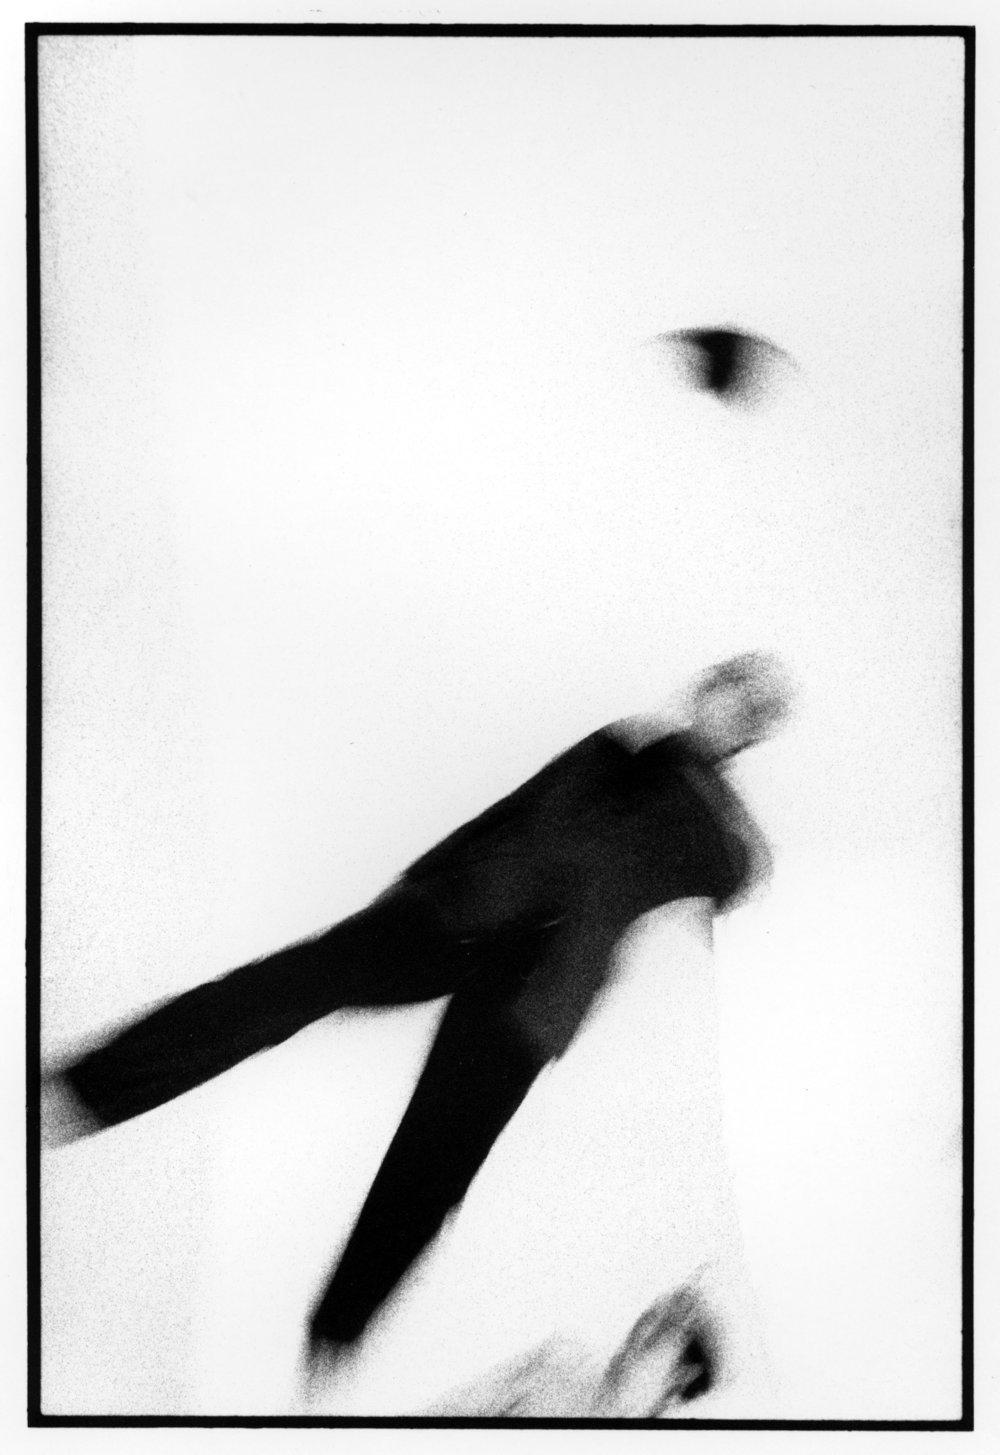 © Anja Hitzenberger